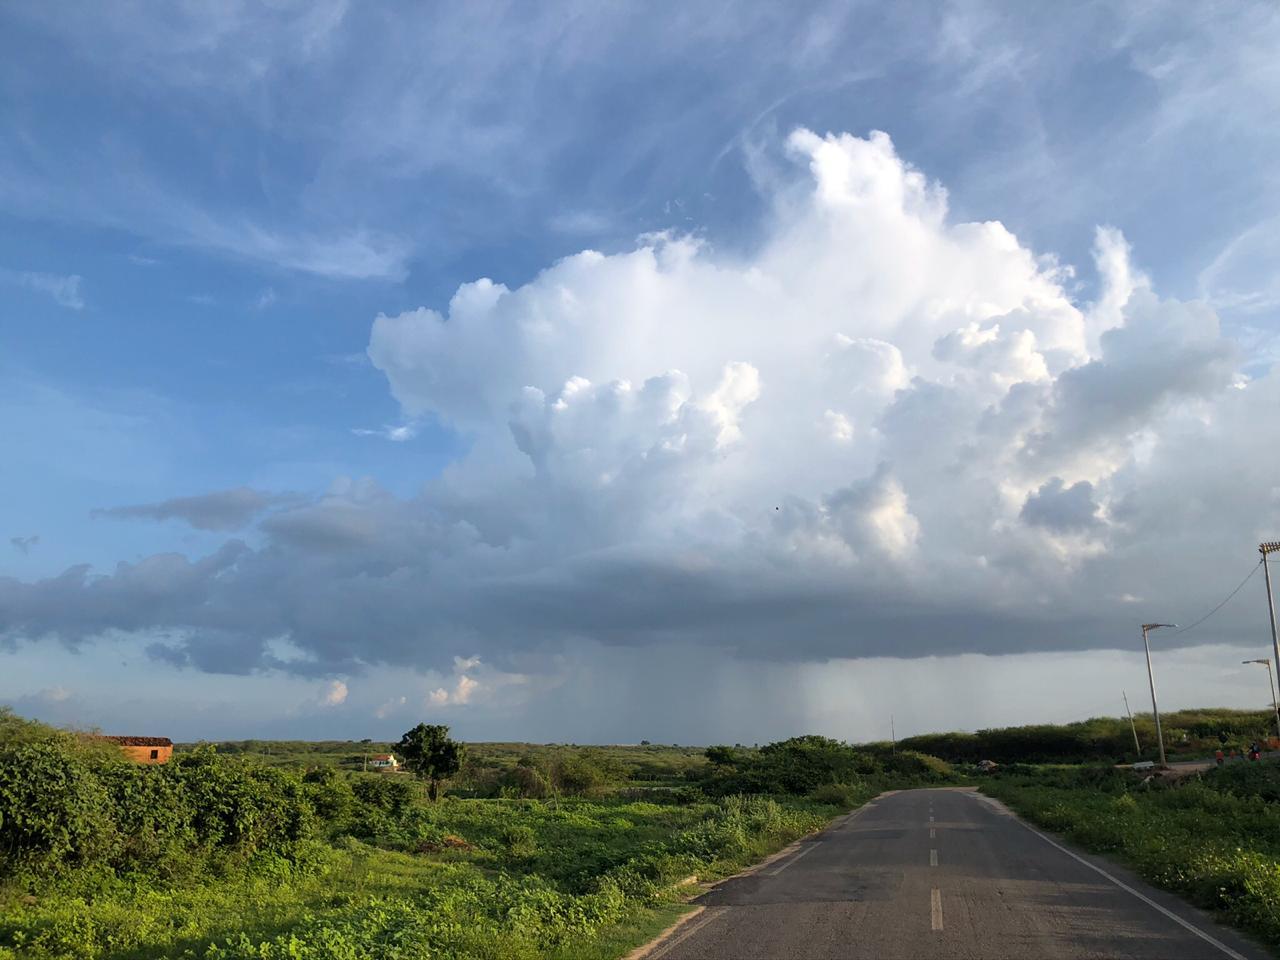 Funceme divulga prognóstico de chuvas para trimestre de março a maio, confira